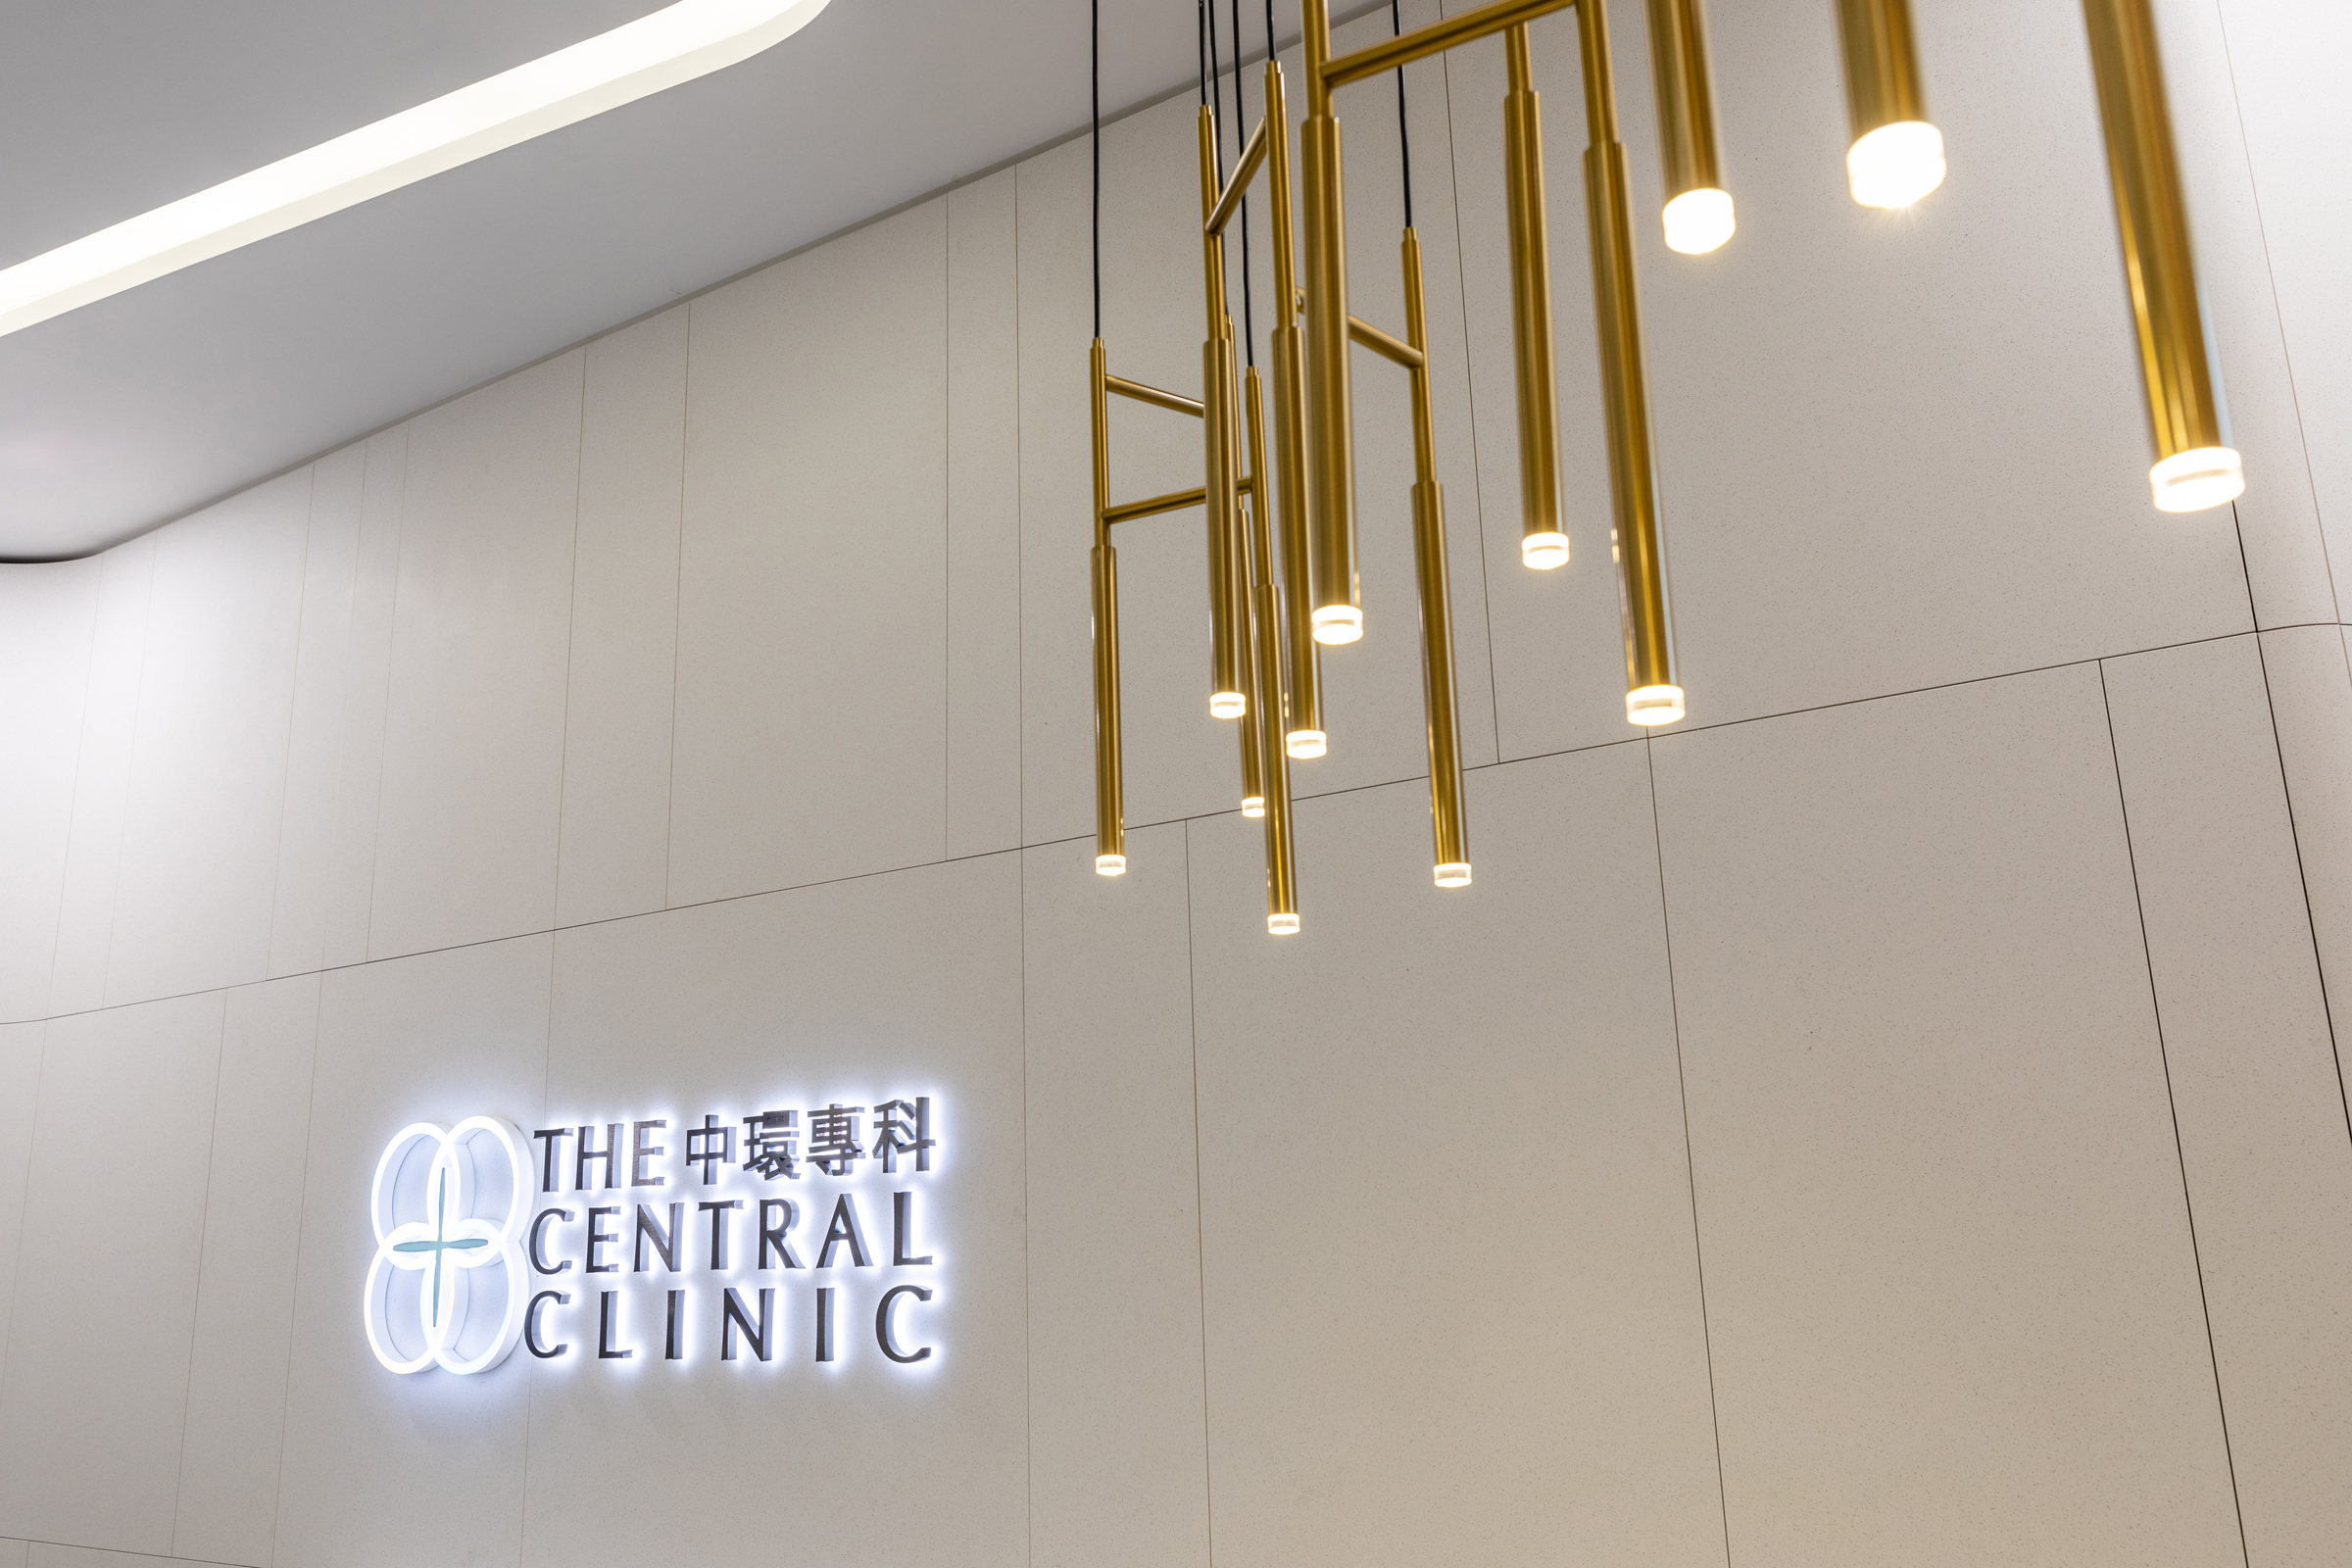 The Central Clinic - 中環專科 - Medical clinic